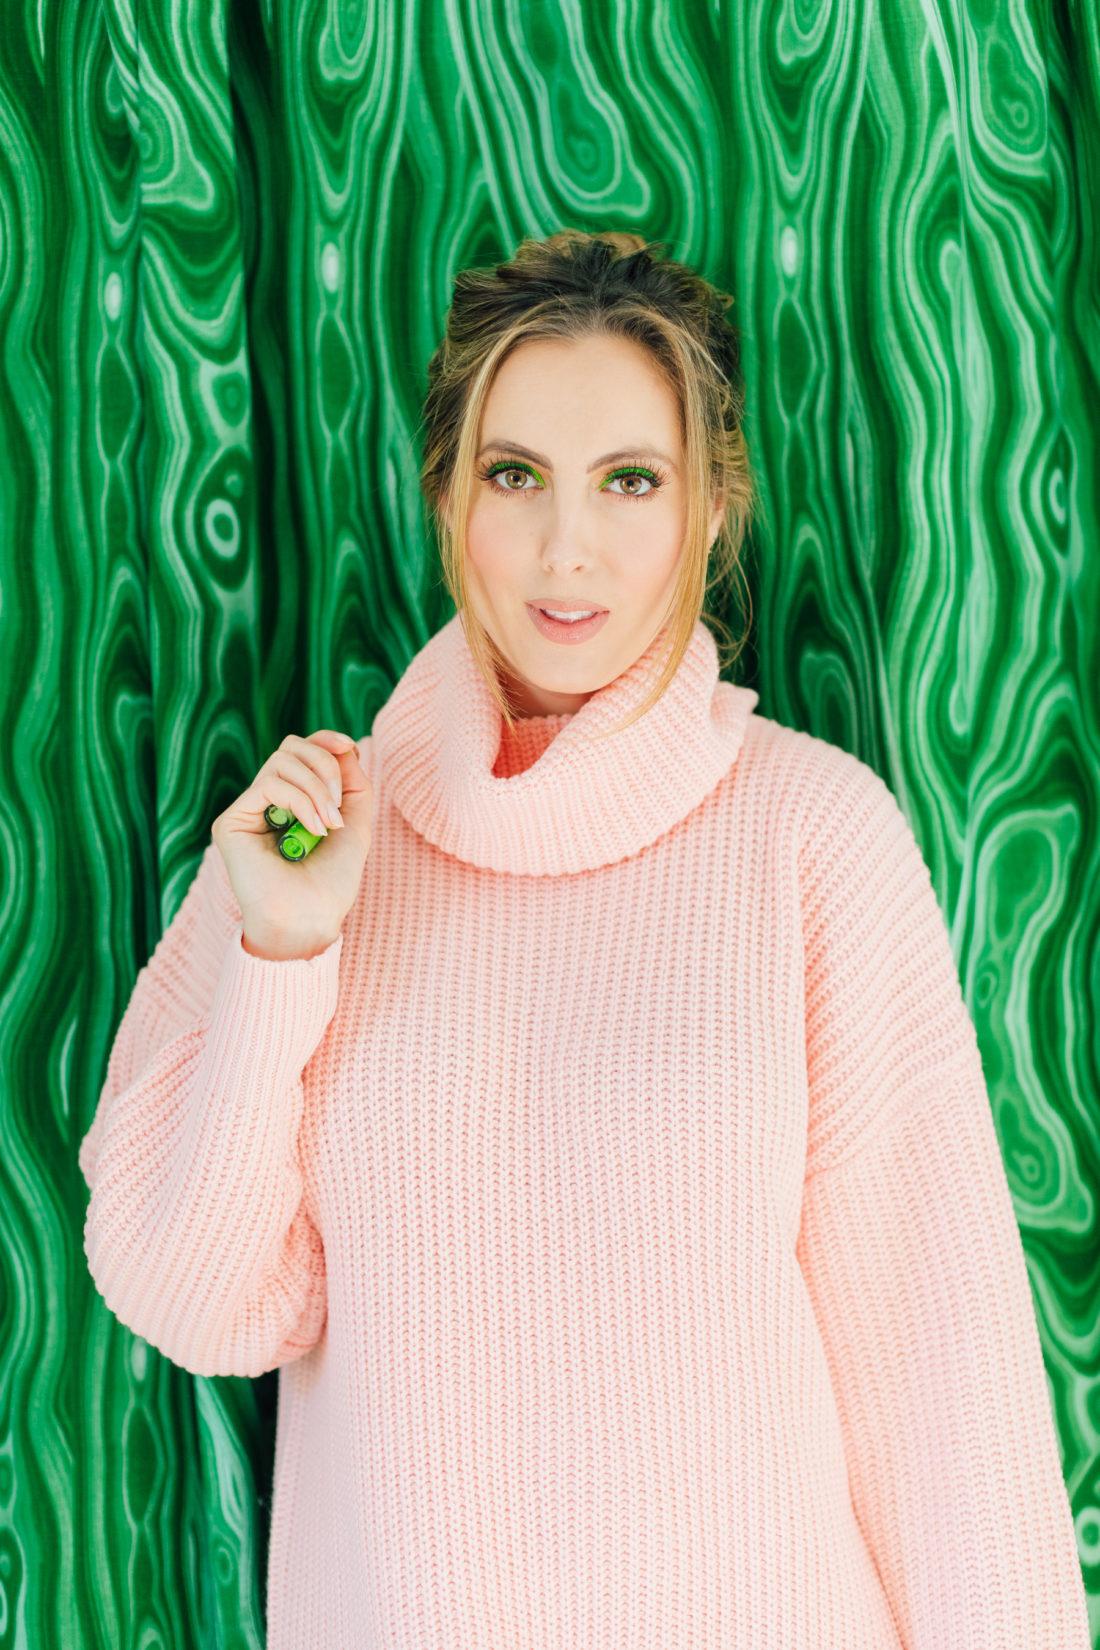 Eva Amurri Martino wears neon green Fenty eyeliner